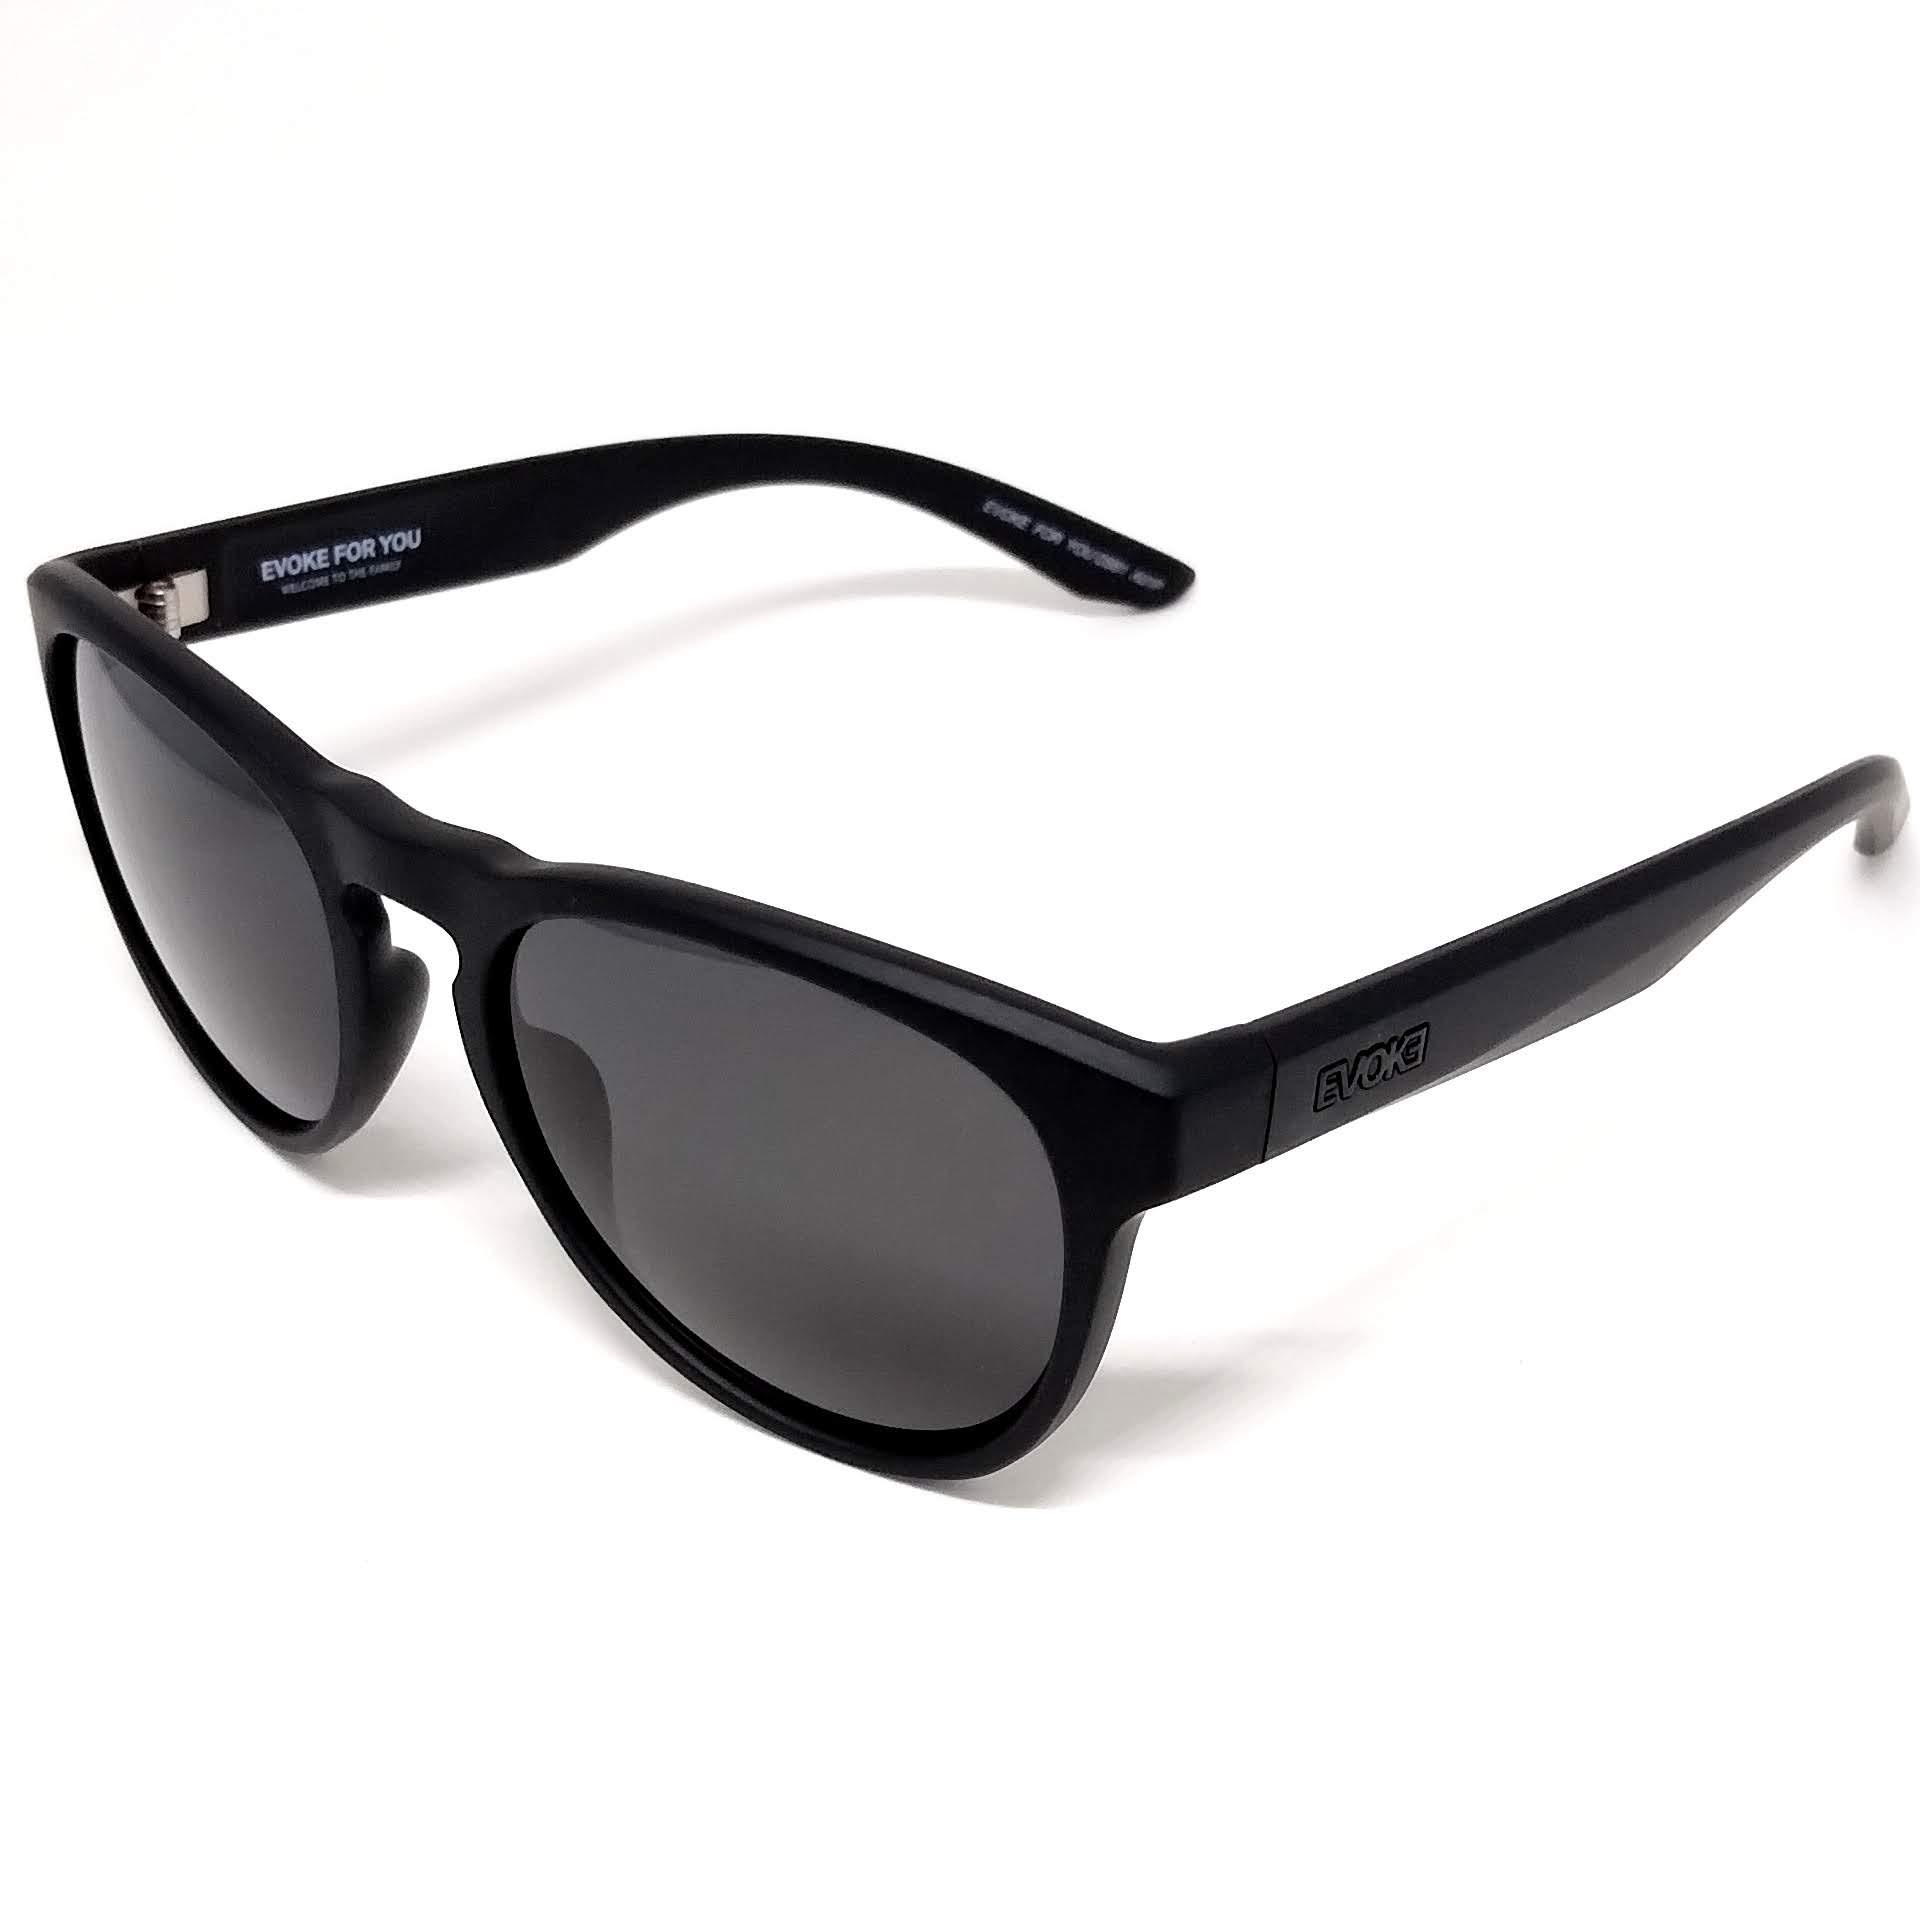 Óculos de Sol Polarizado Evoke DS61 A01P Preto Fosco NF